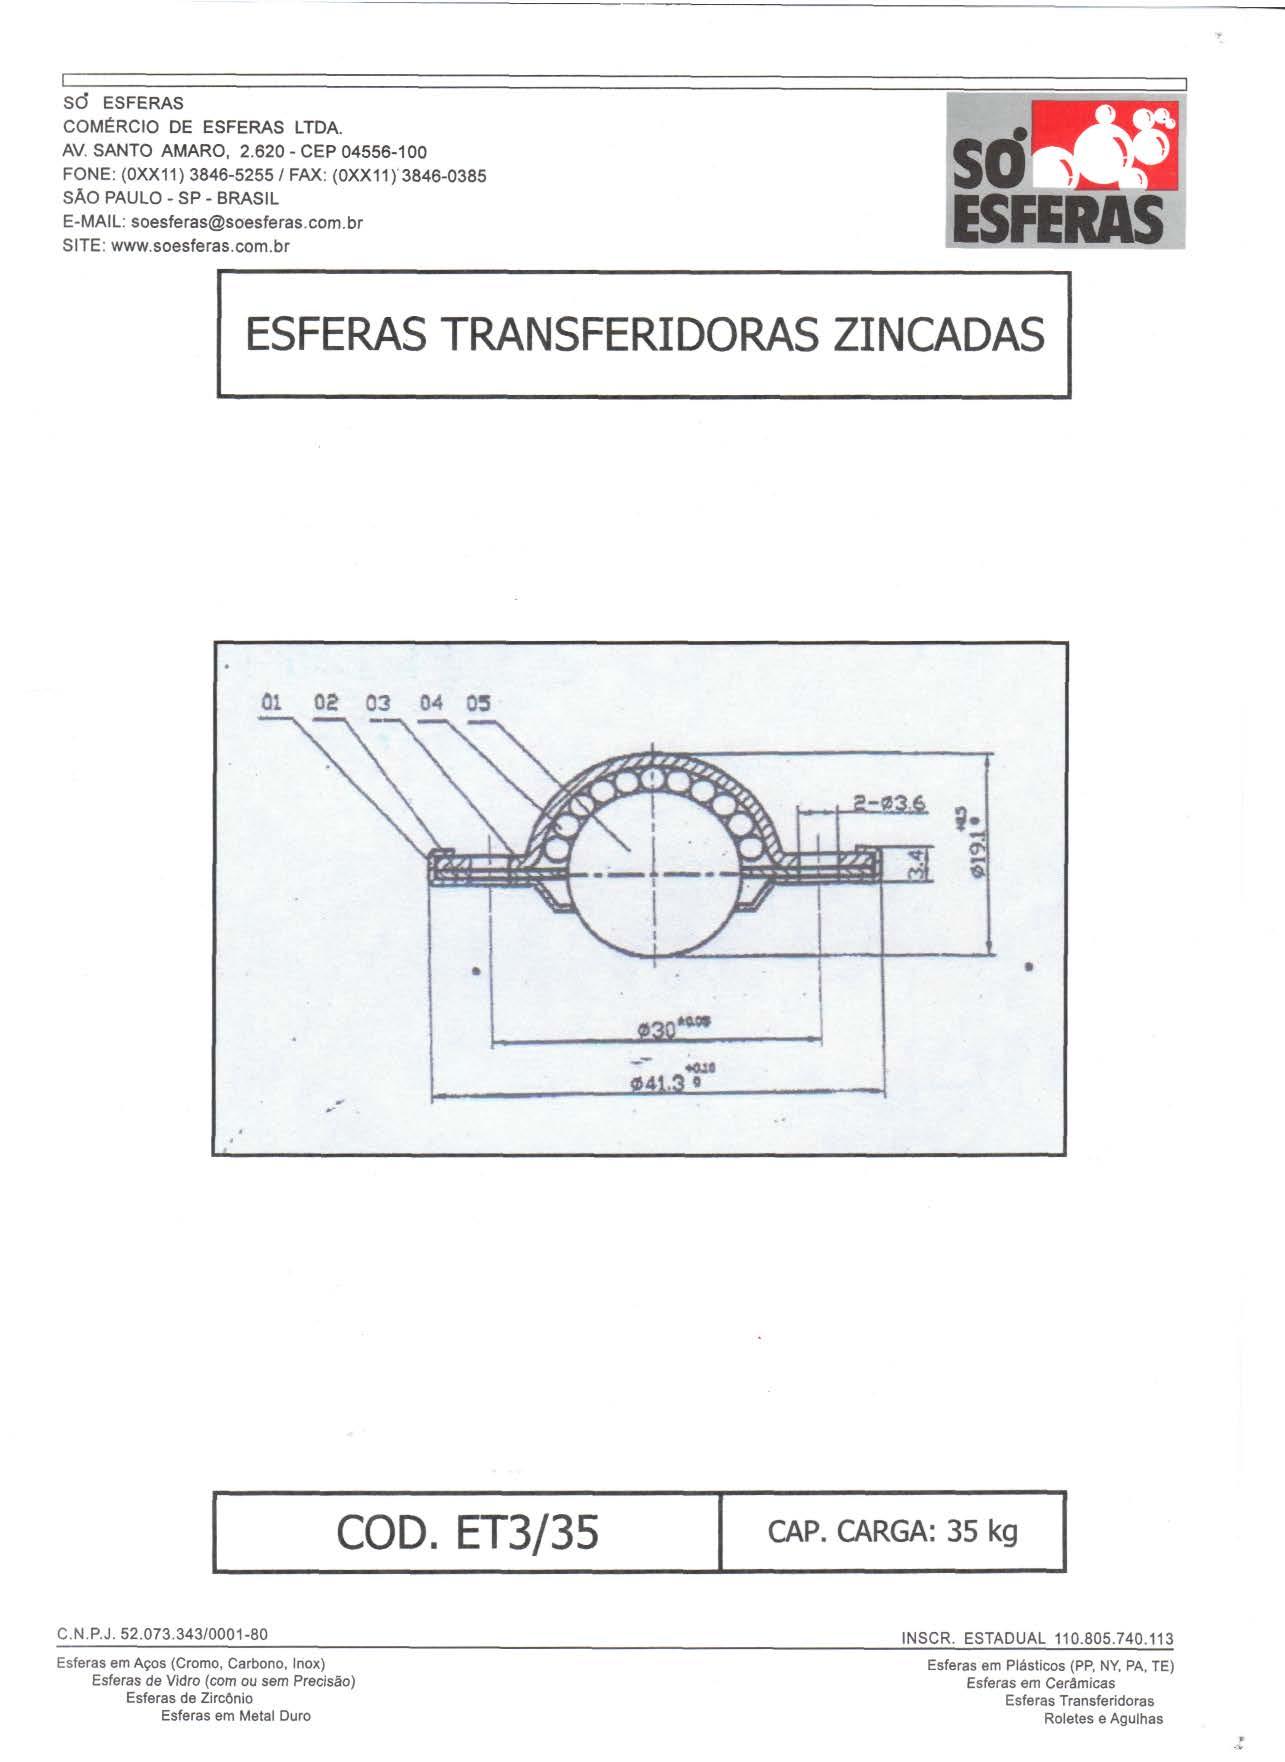 Esferas Transferidoras